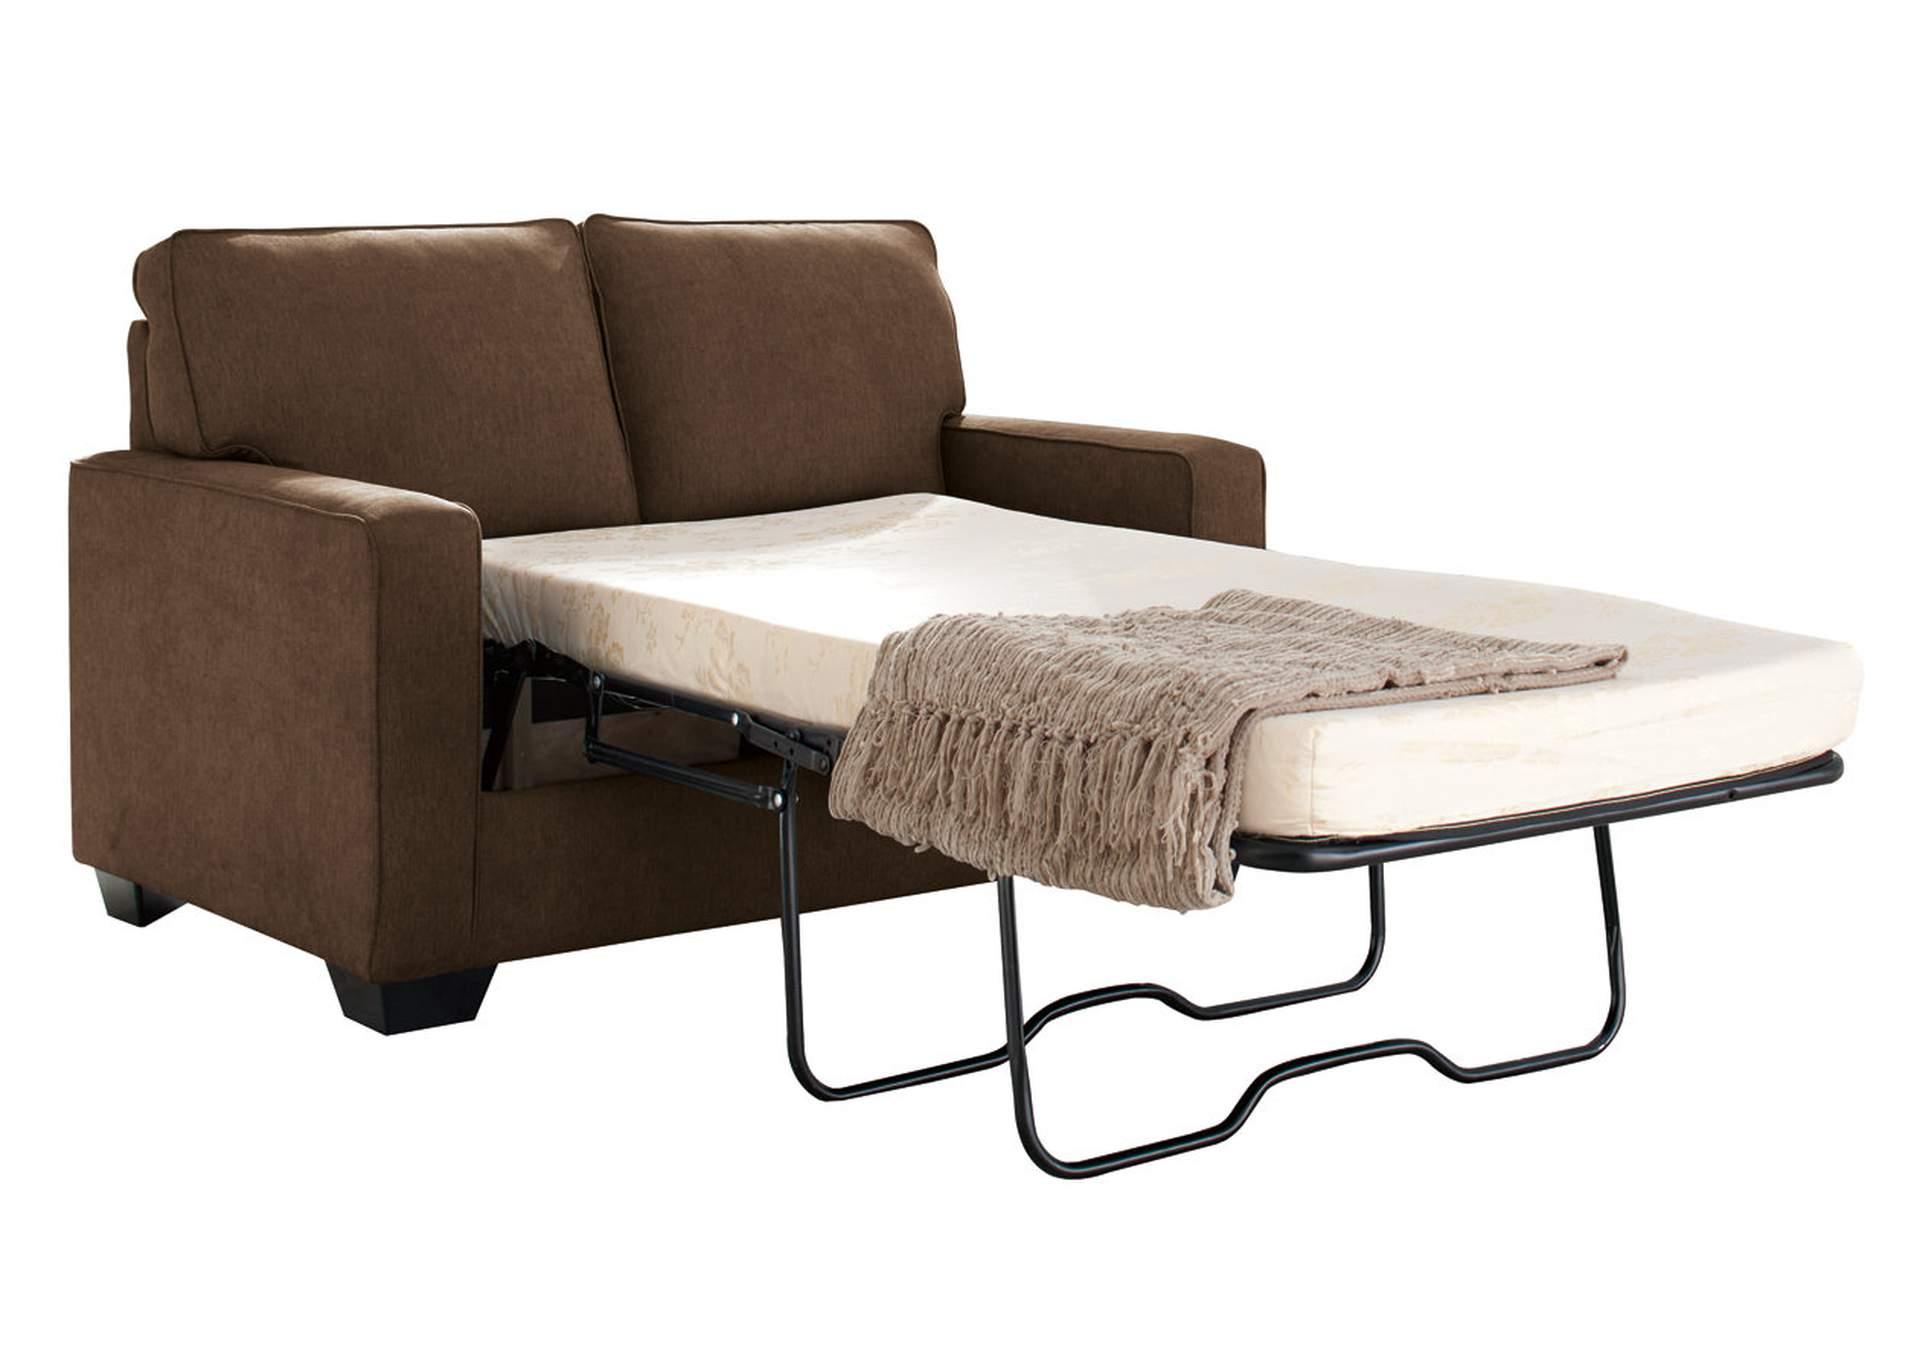 Curly s Furniture Zeb Espresso Twin Sofa Sleeper